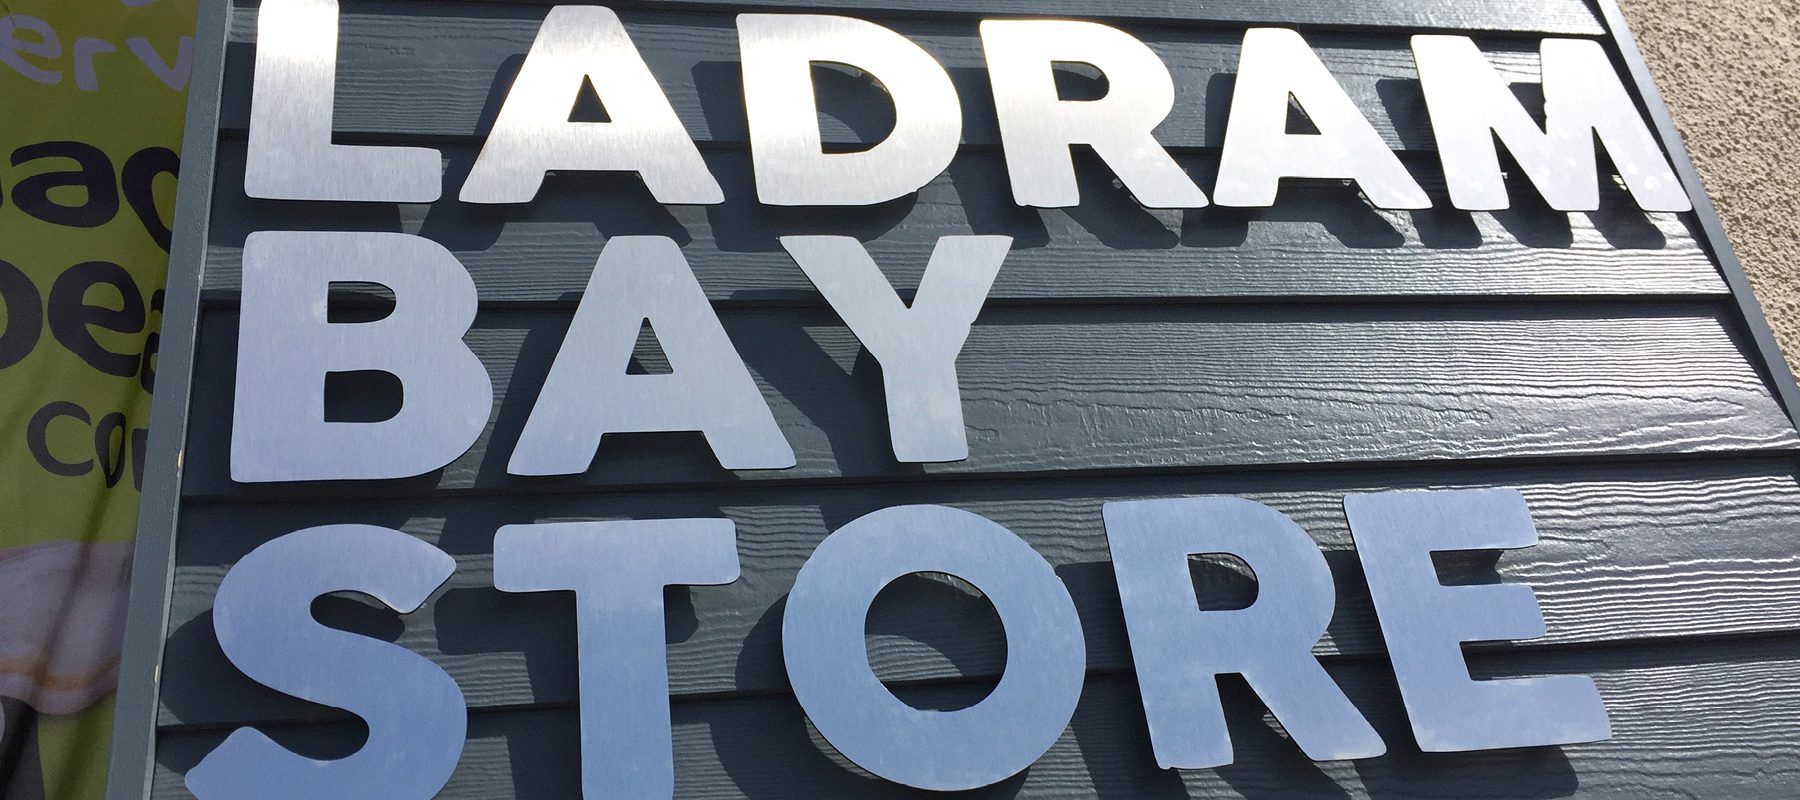 ladram bay store sign logo